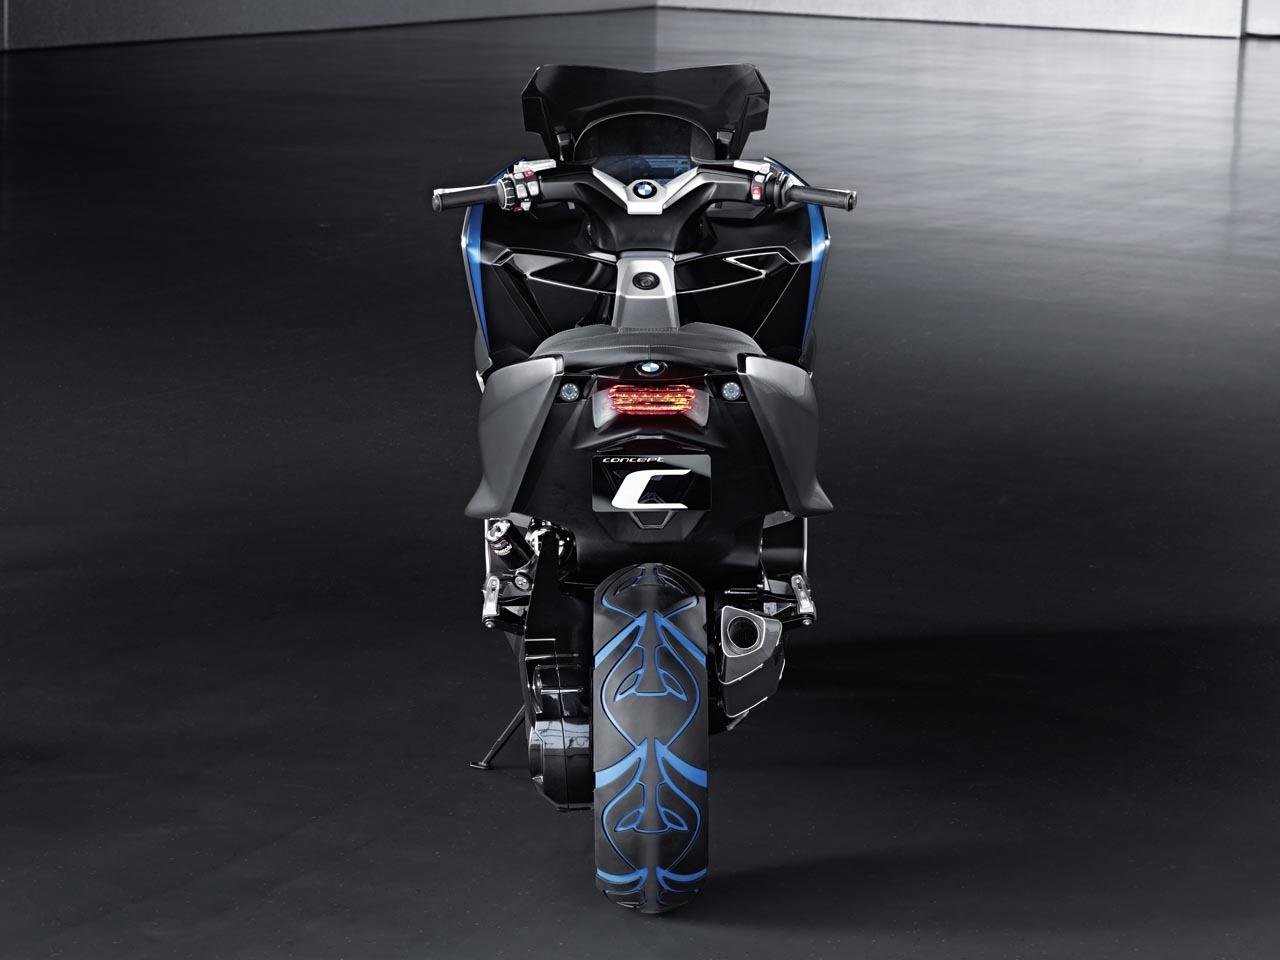 Foto de BMW Concept C Scooter, el Scooter del futuro según BMW (6/19)